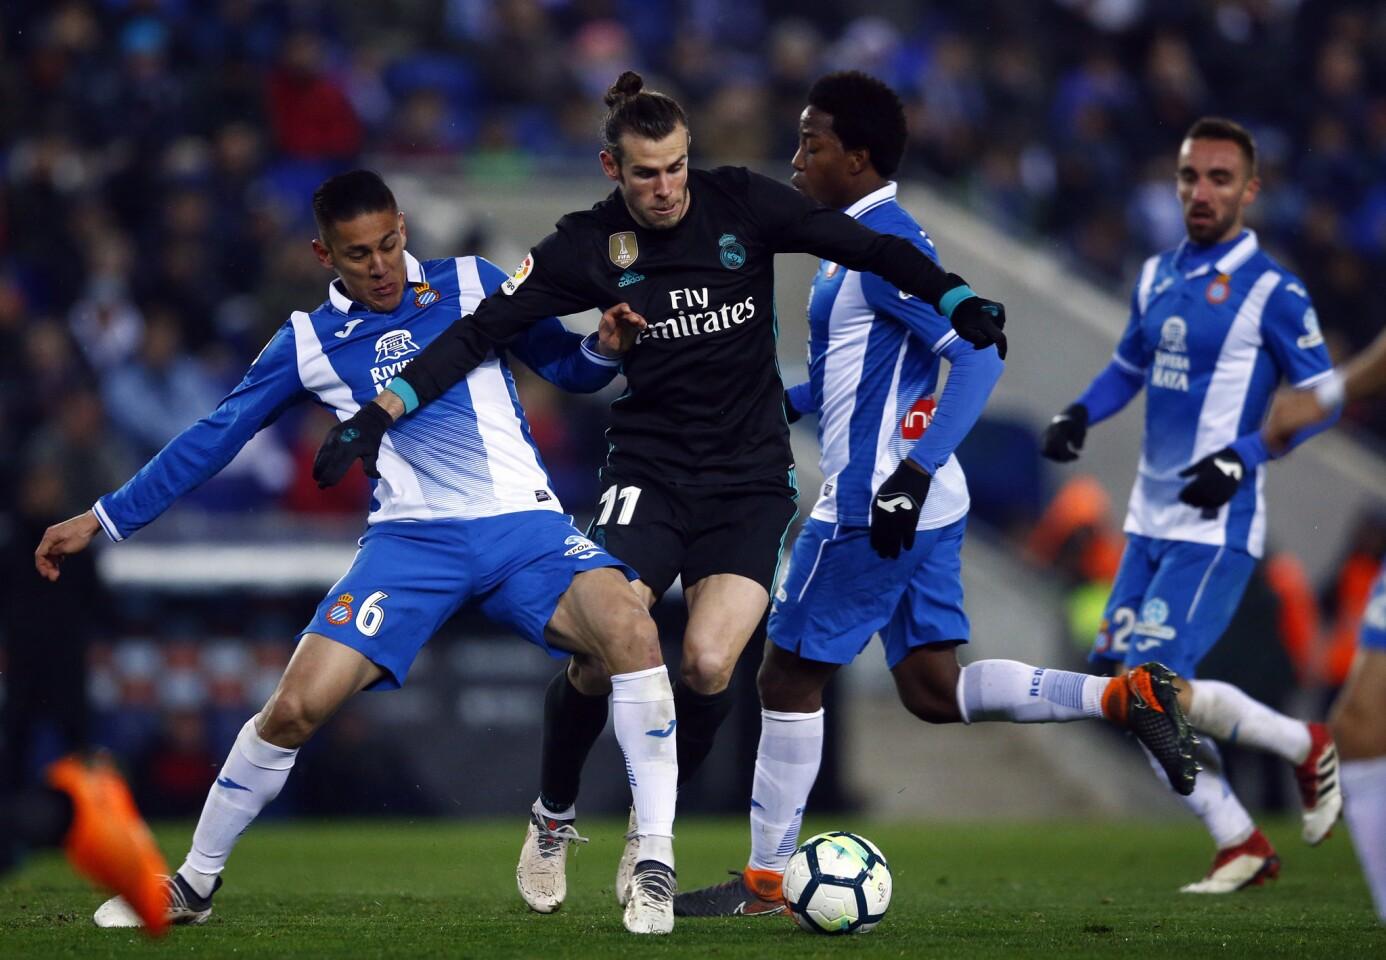 Real Madrid's Gareth Bale, center, vies for the ball with Espanyol Oscar Duarte, left, during the Spanish La Liga soccer match between Espanyol and Real Madrid at RCDE stadium in Cornella Llobregat, Spain, Tuesday, Feb. 27, 2018. (AP Photo/Manu Fernandez)